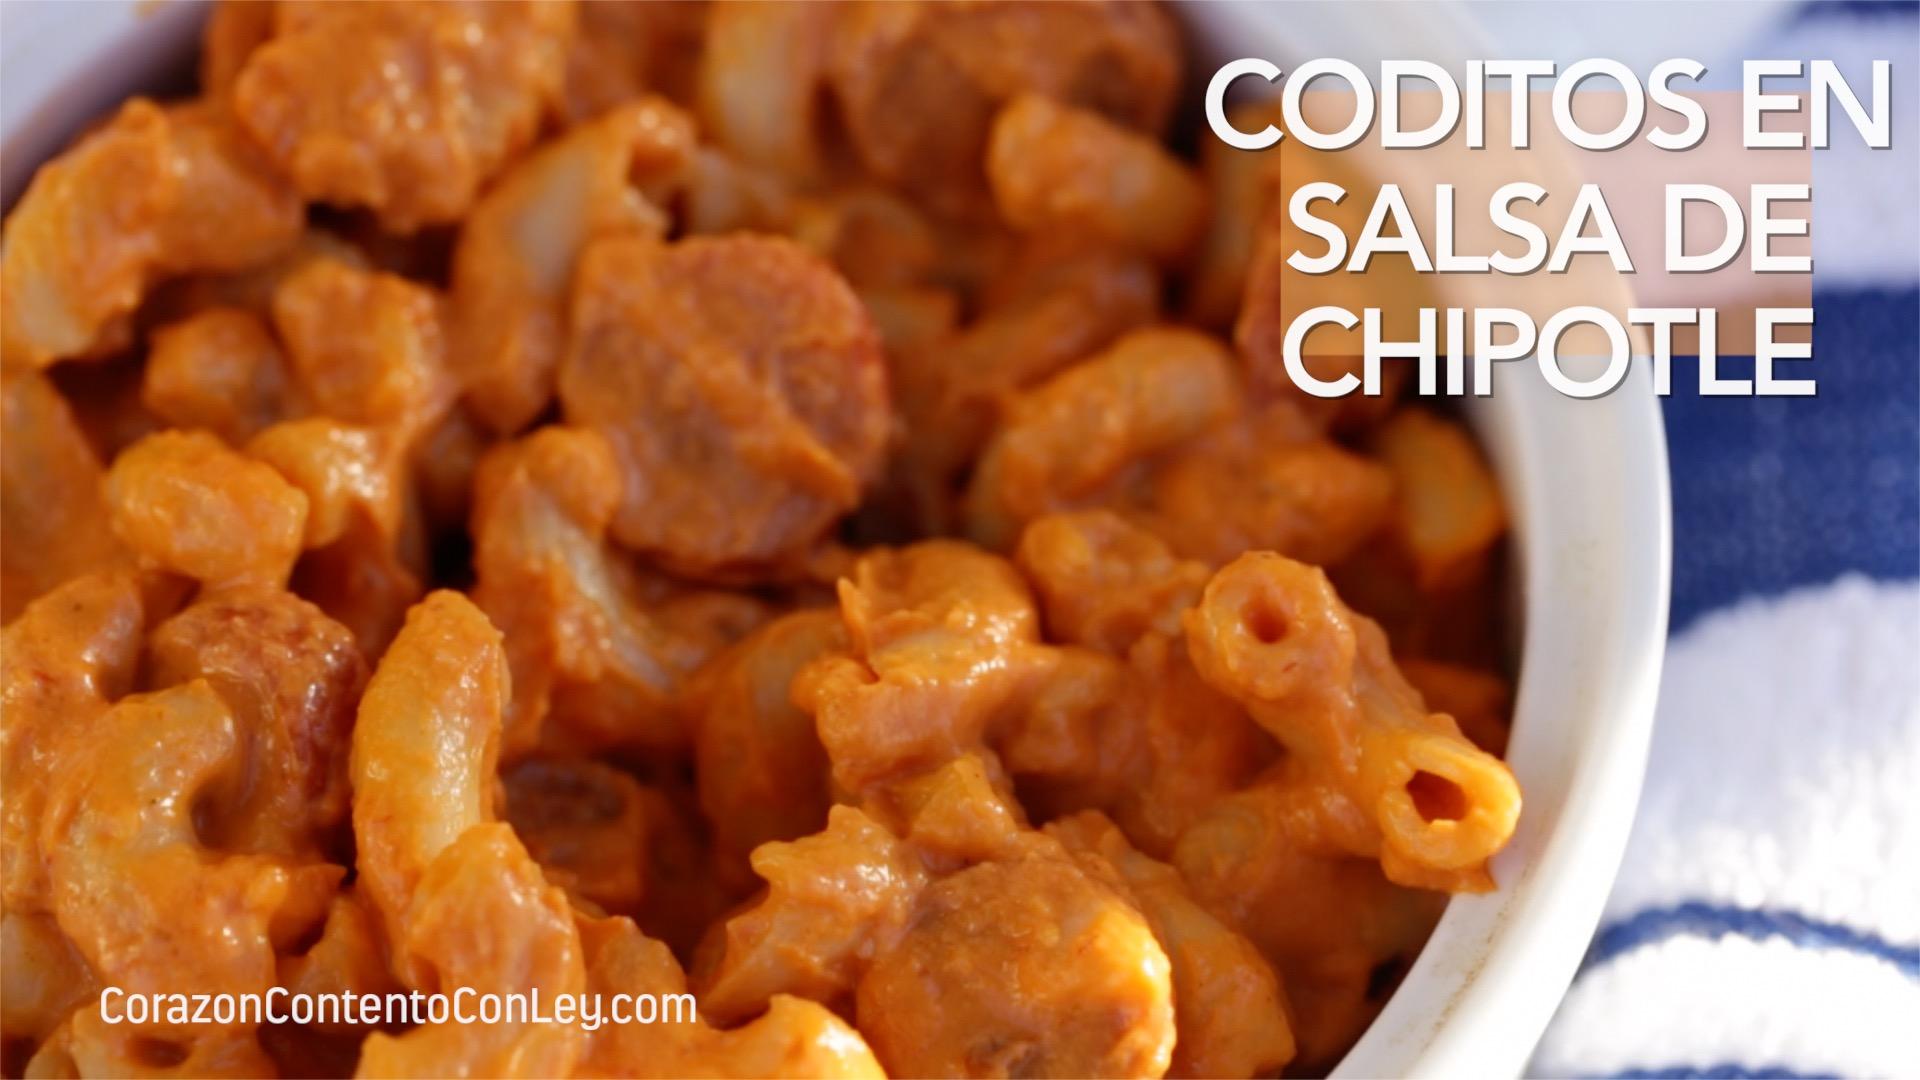 coditos en salsa de chipotle con salchichas corazón contento con ley